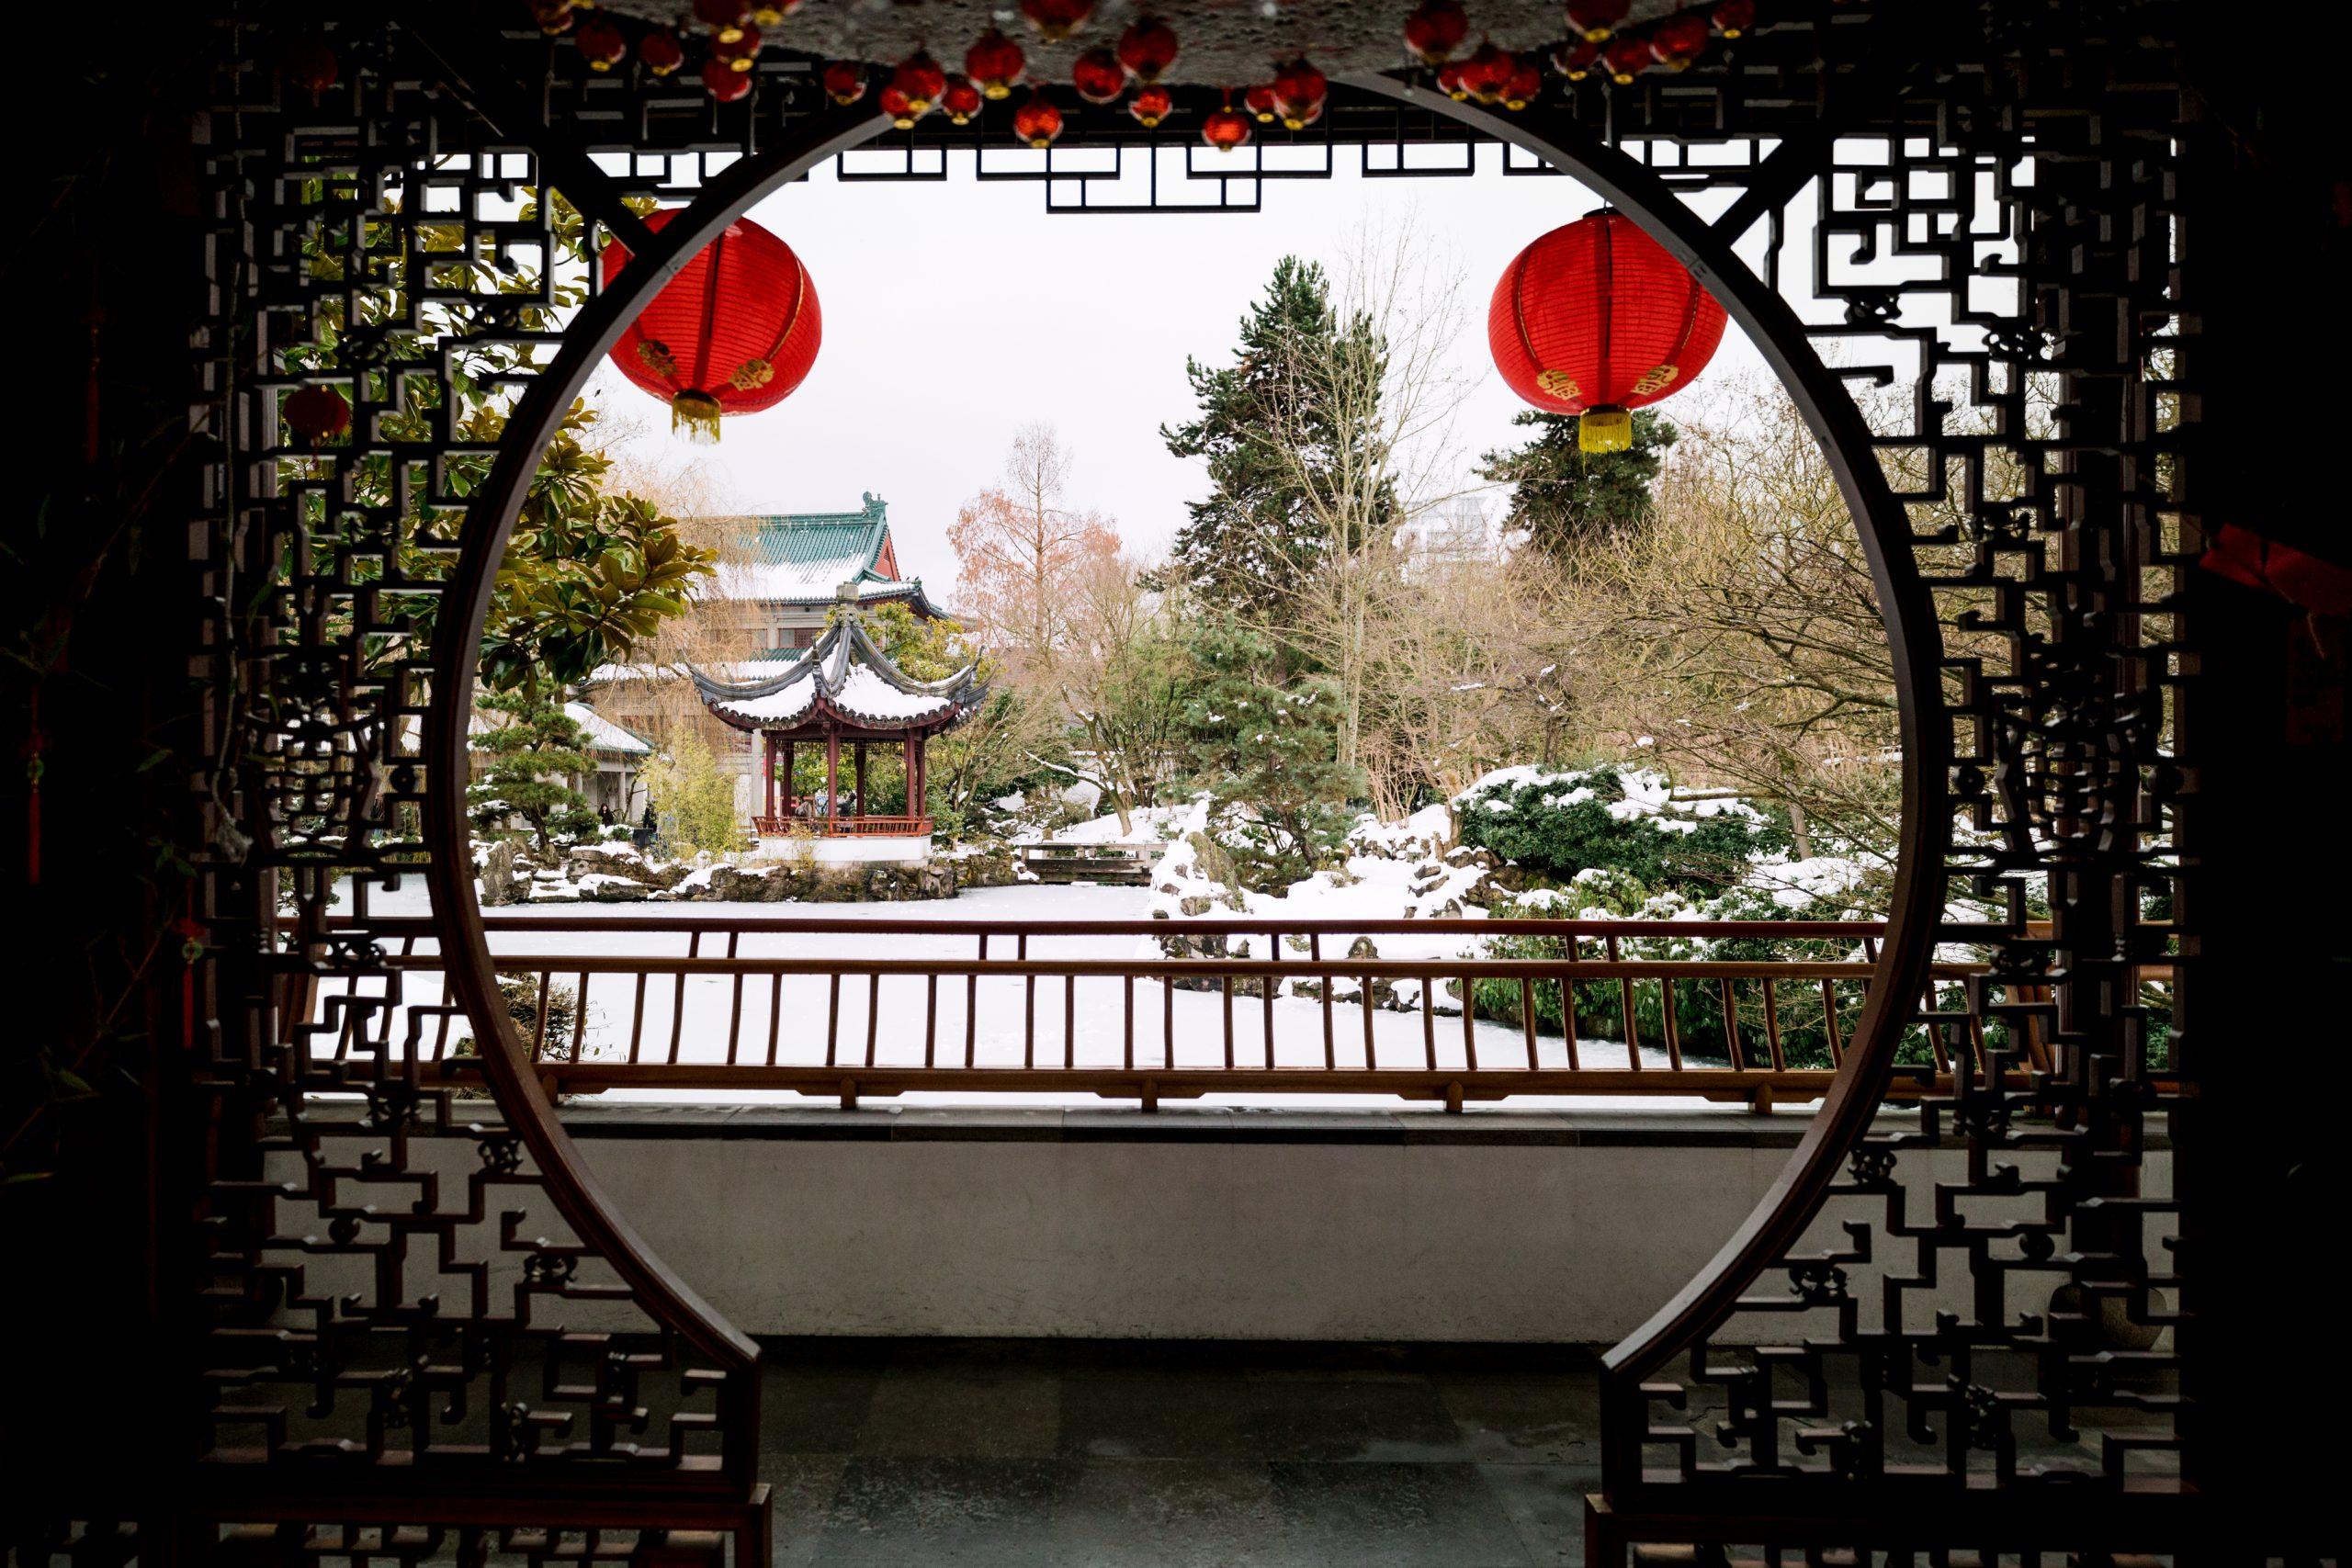 Dr Sun Yat Sen Garden in Vancouver